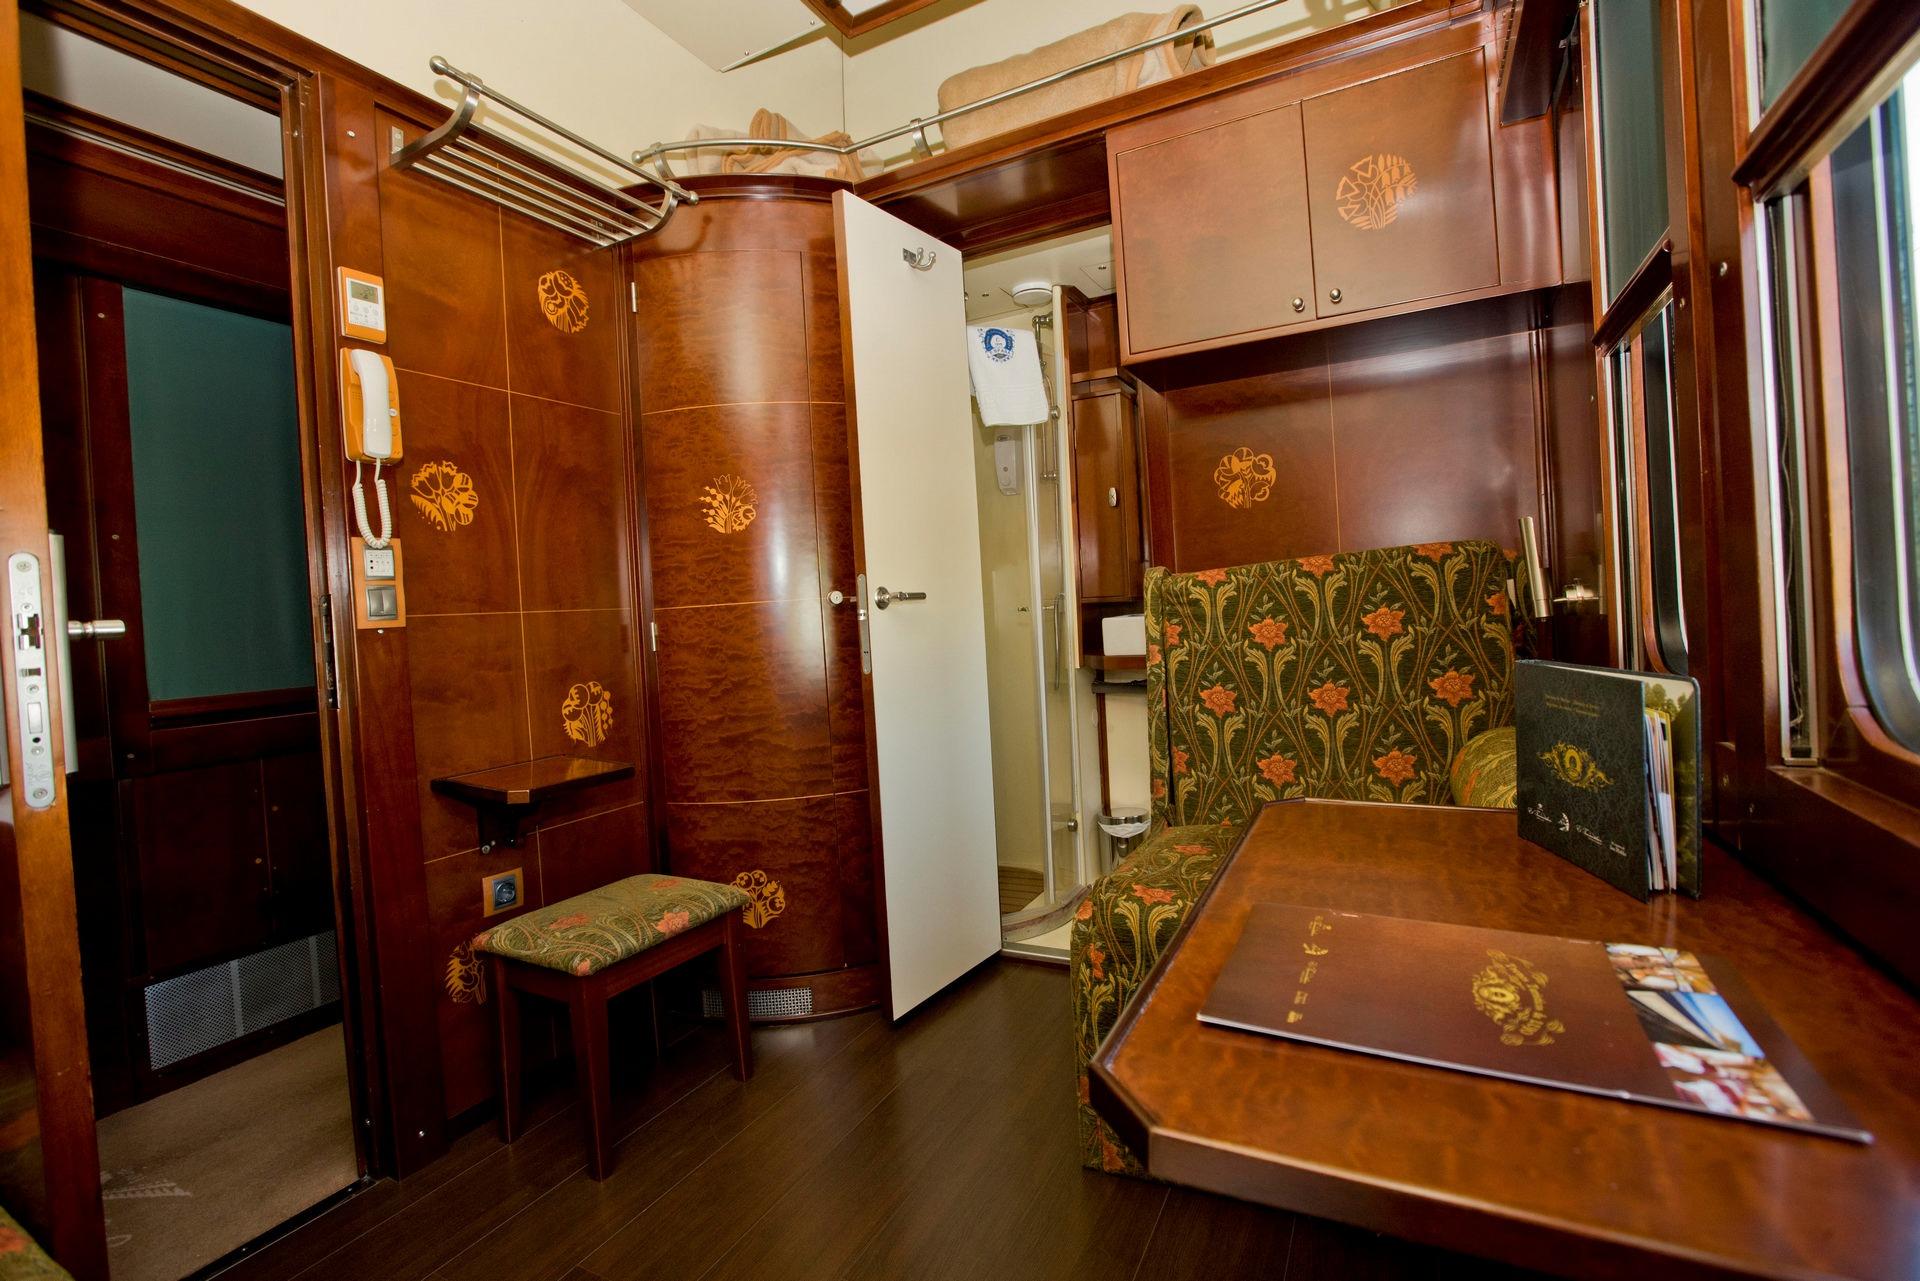 NOMAD-luksusowe-pociągi-w-Hiszpani-Al-Andalus-03